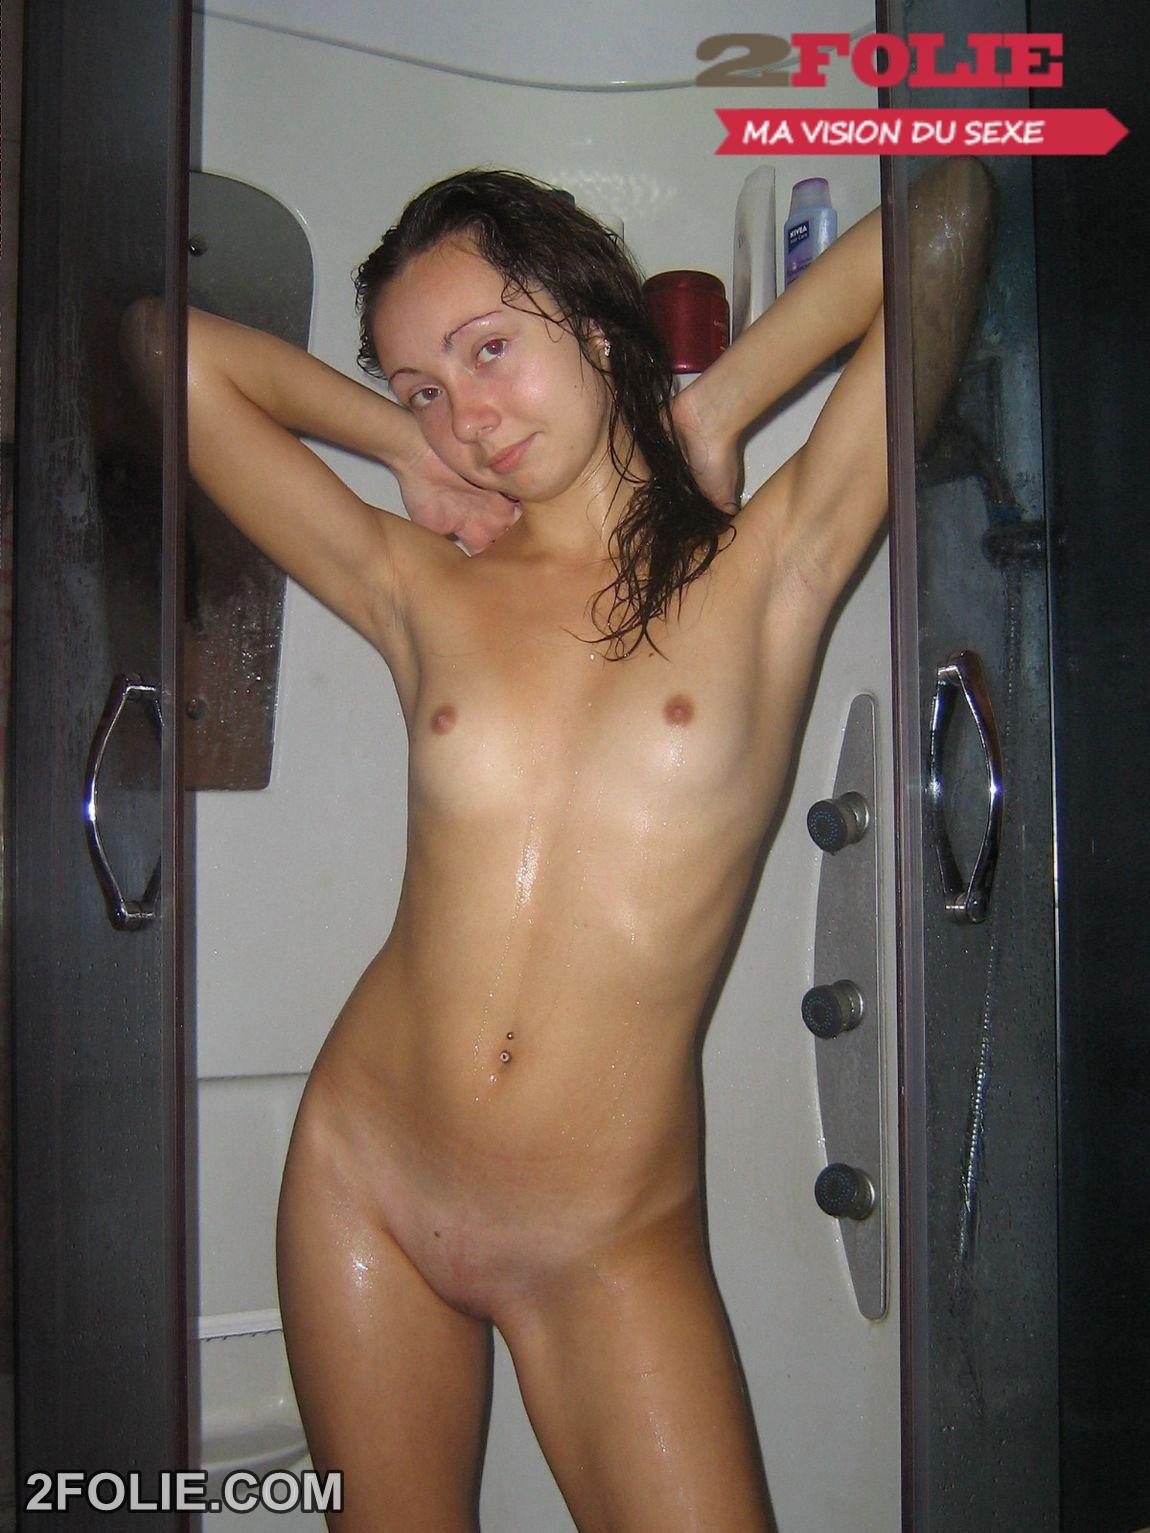 dessin anime sexe sexe sous la douche